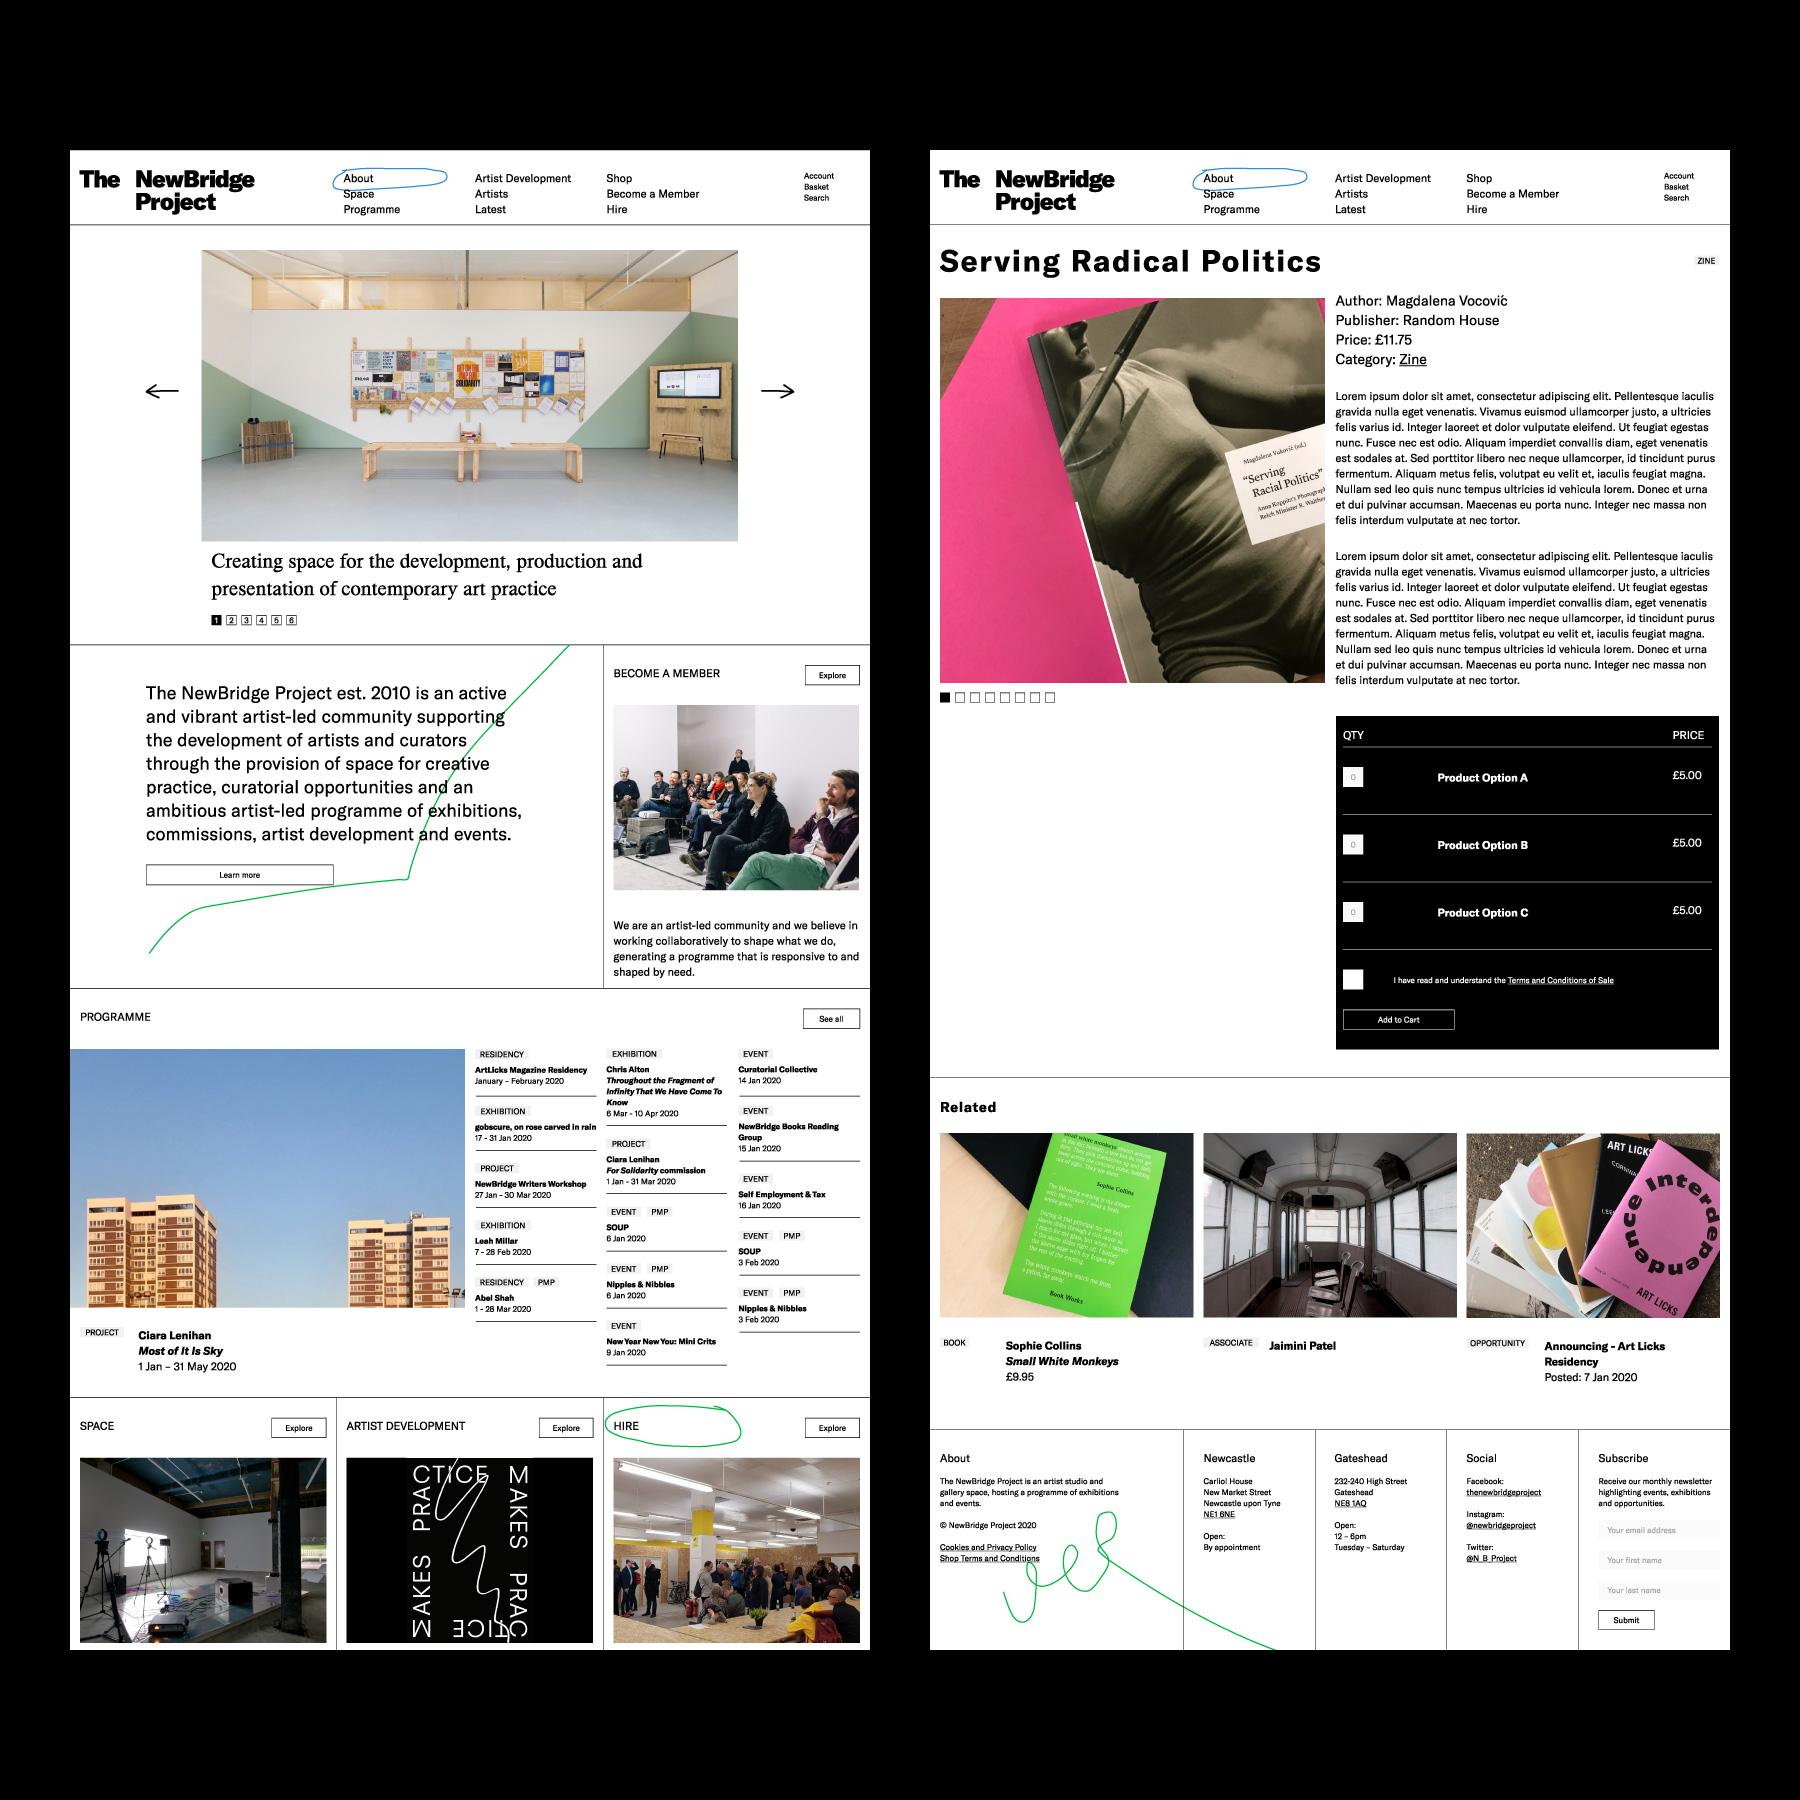 supanaught-newbridge-project-website-design